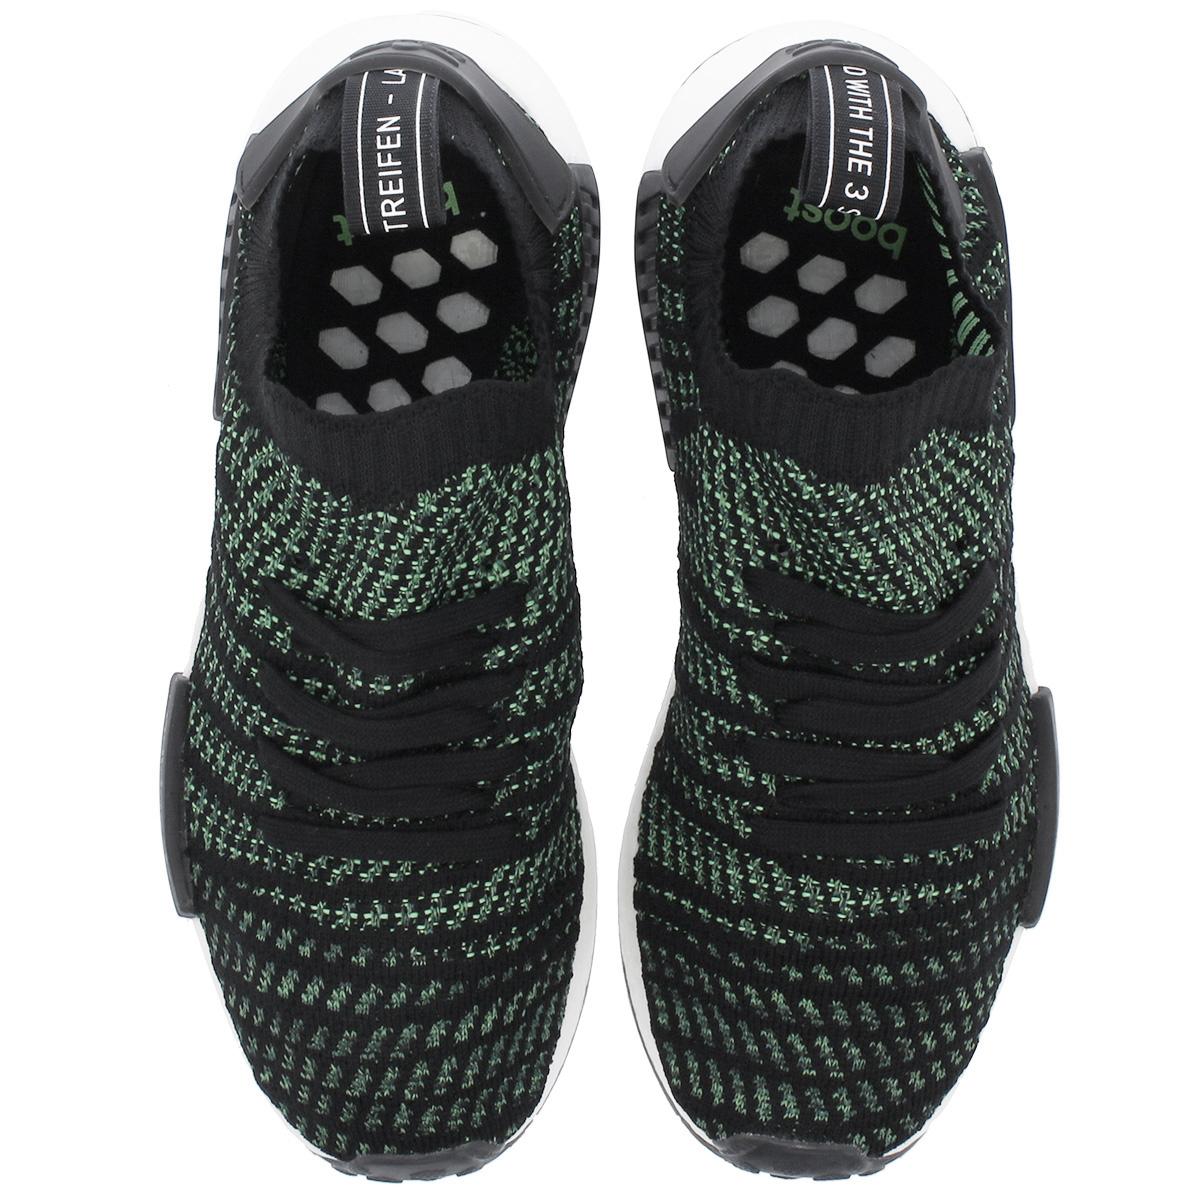 62b349c33 adidas NMD R1 STLT PK Adidas NMD R1 STLT PK CORE BLACK NOBLE GREEN BOLD  GREEN aq0936